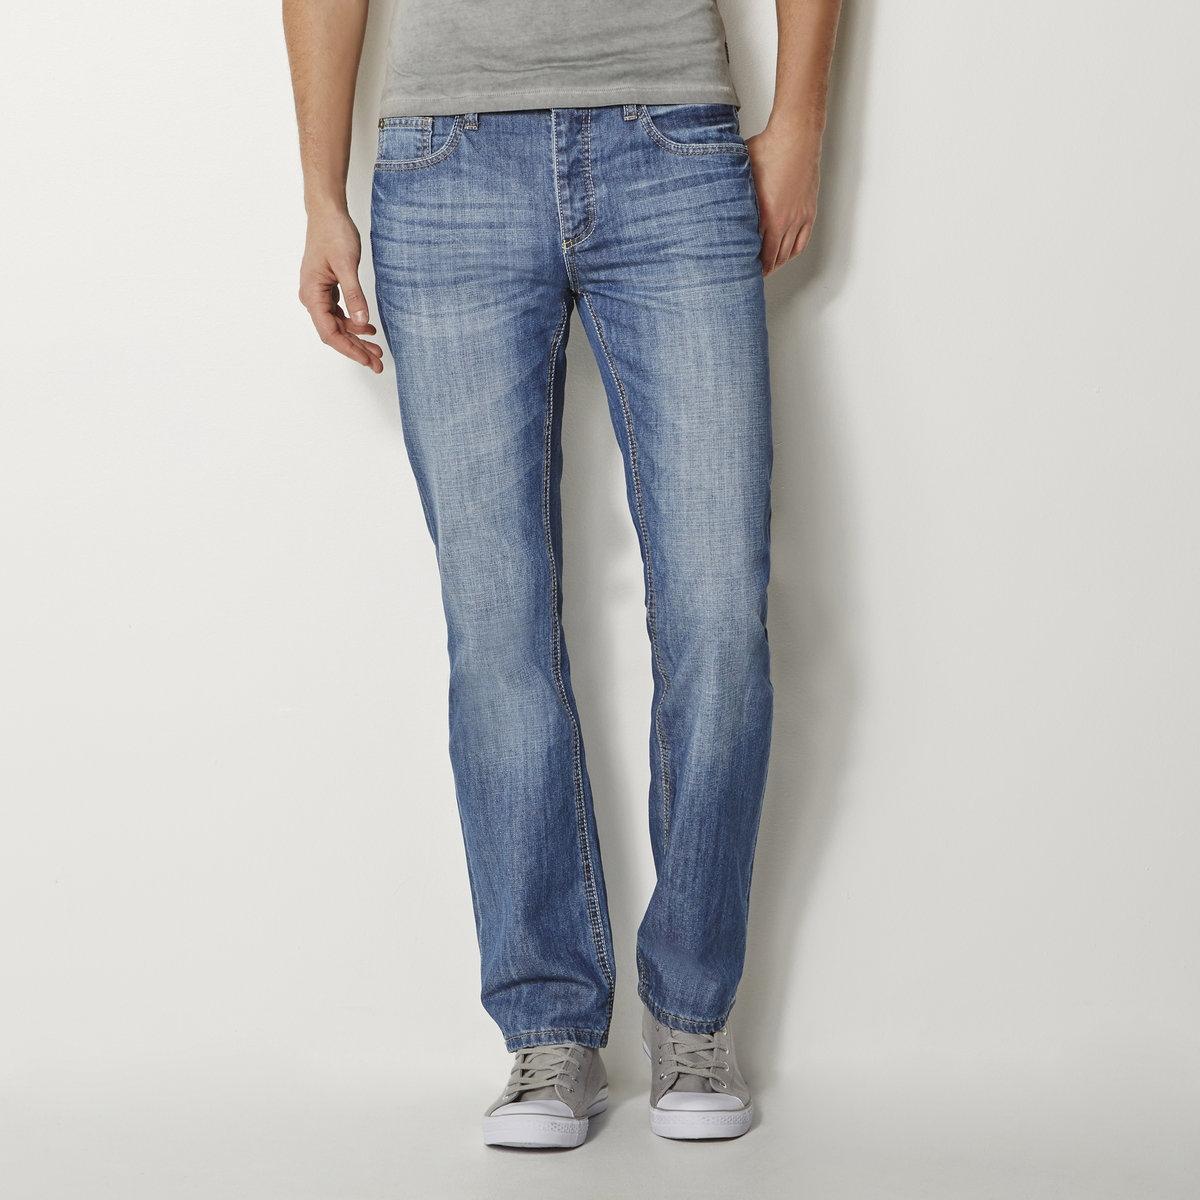 Jeans regular (direitos), comp. 32